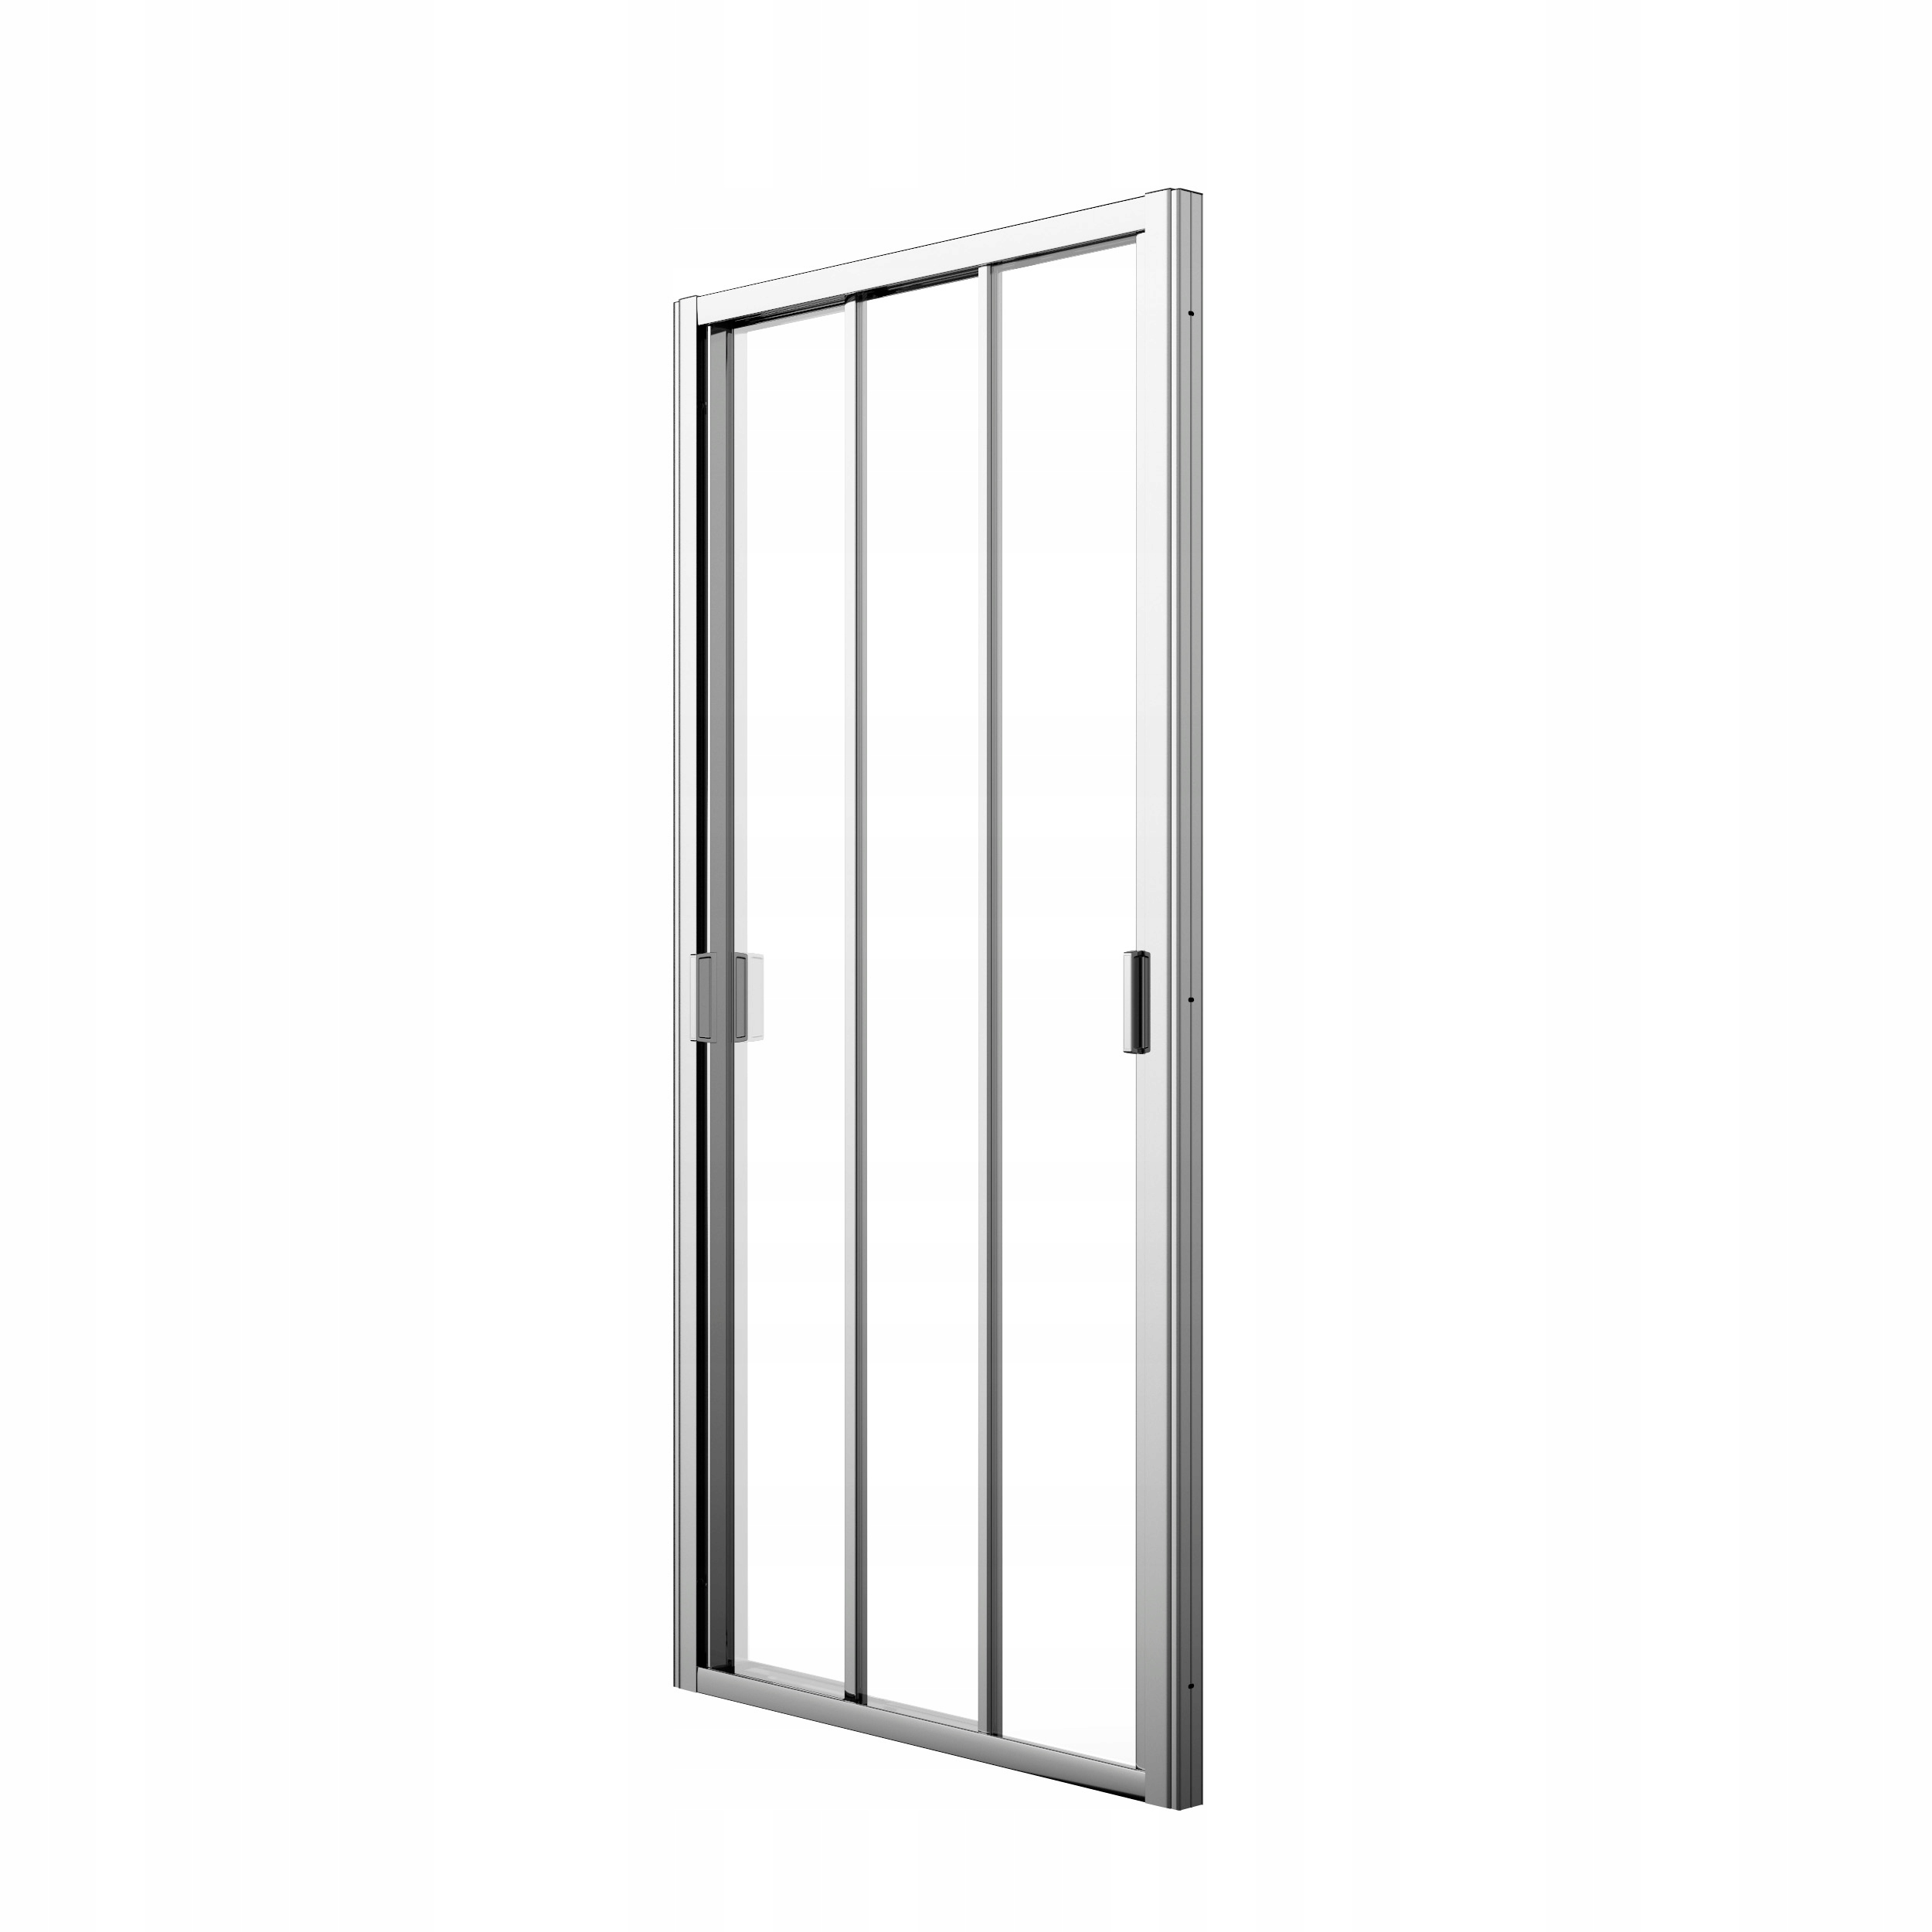 Sprchové dvere EVO DW 85x200 cm RADAWAY